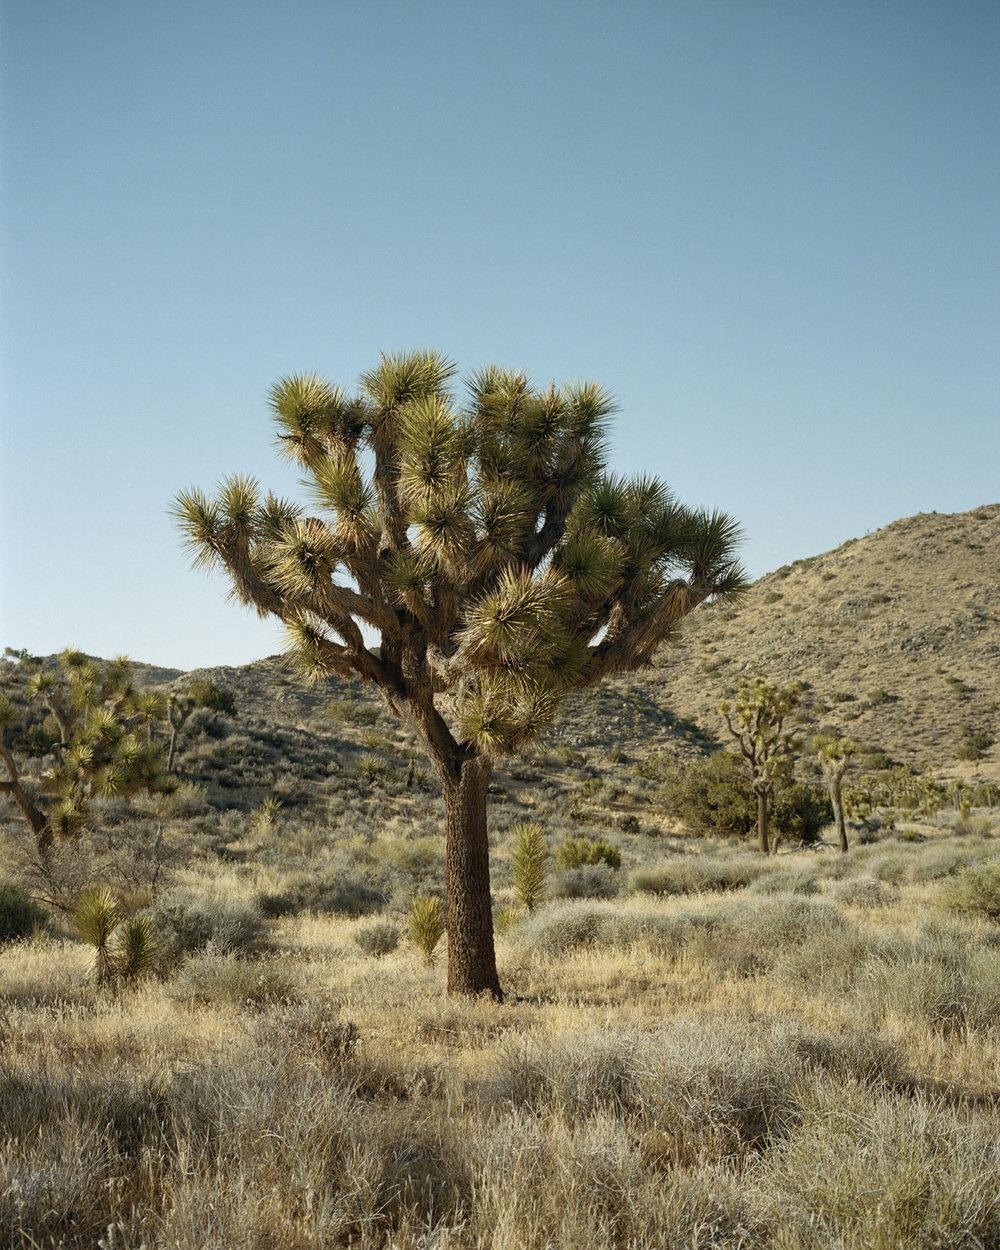 joshua tree001.jpg